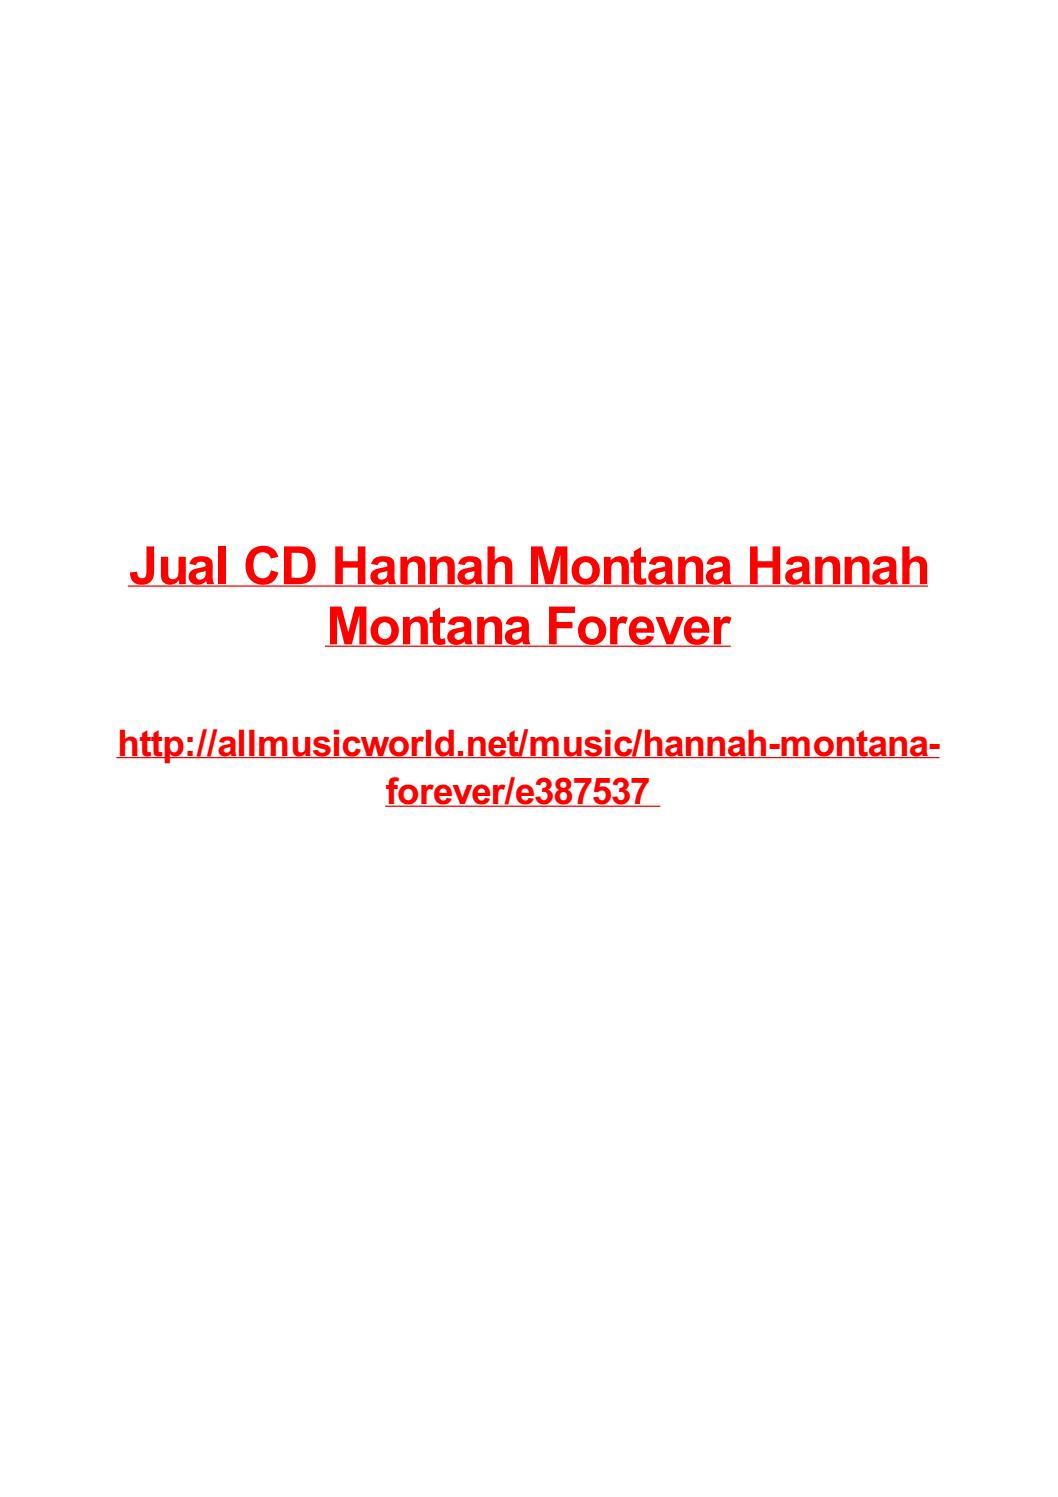 Jual cd hannah montana hannah montana forever by Frank Seamons - issuu